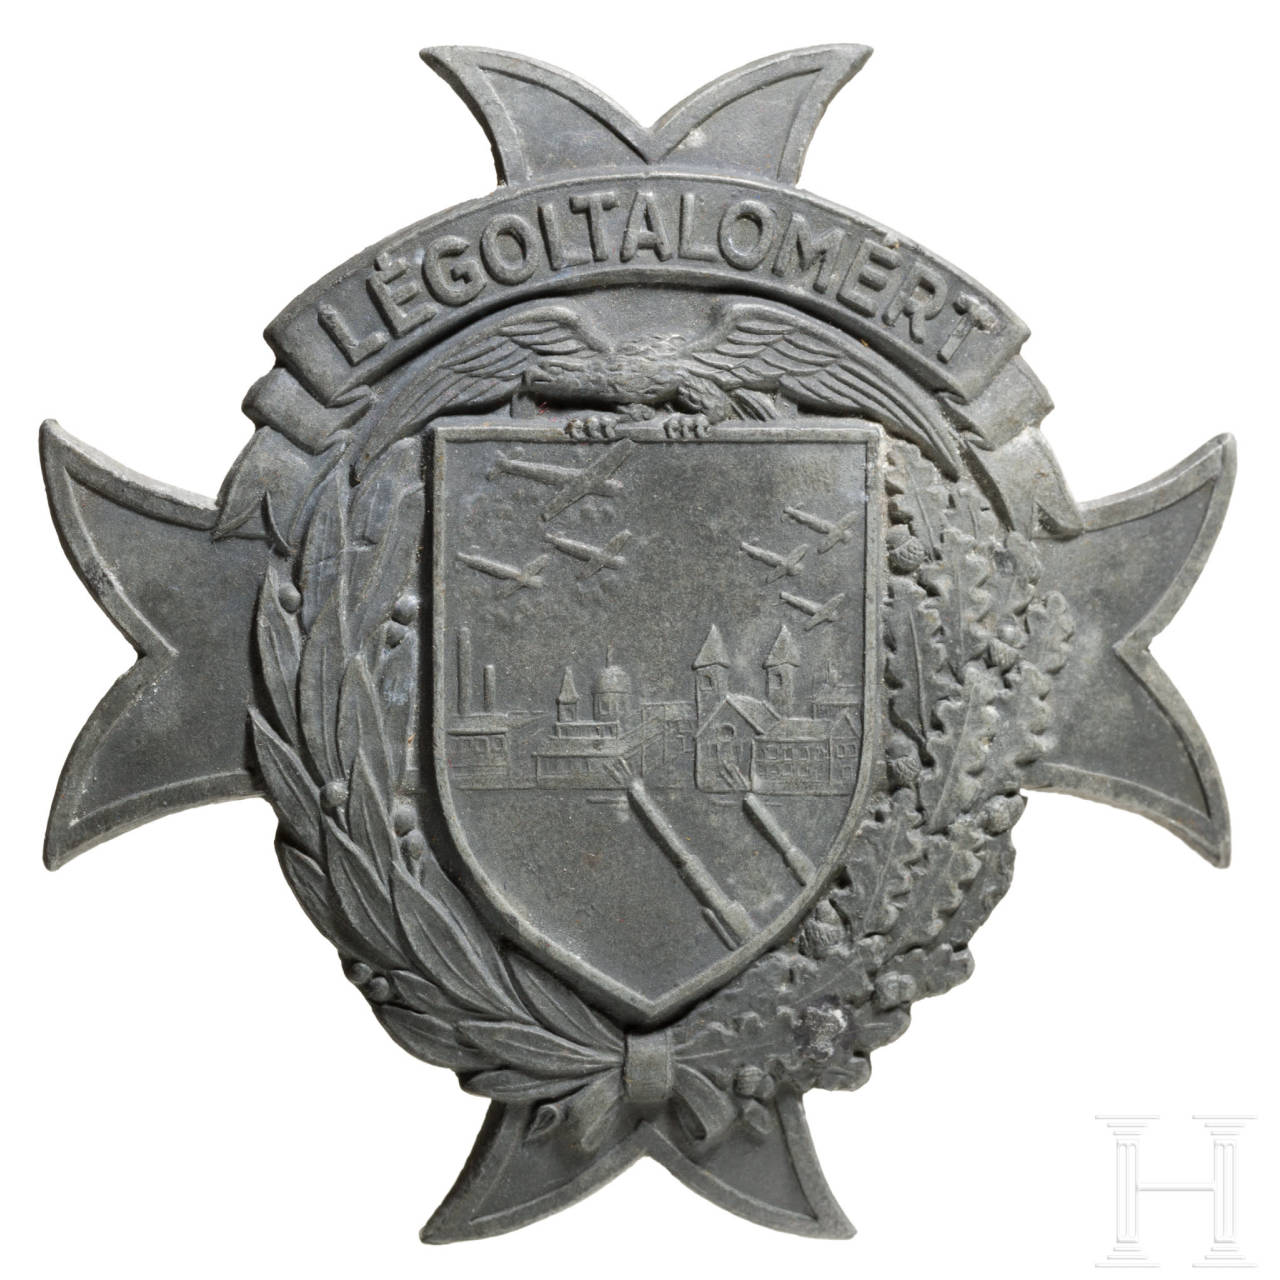 "Flak battle badge ""Légoltalomért"", Hungary, 1940s, World War II"